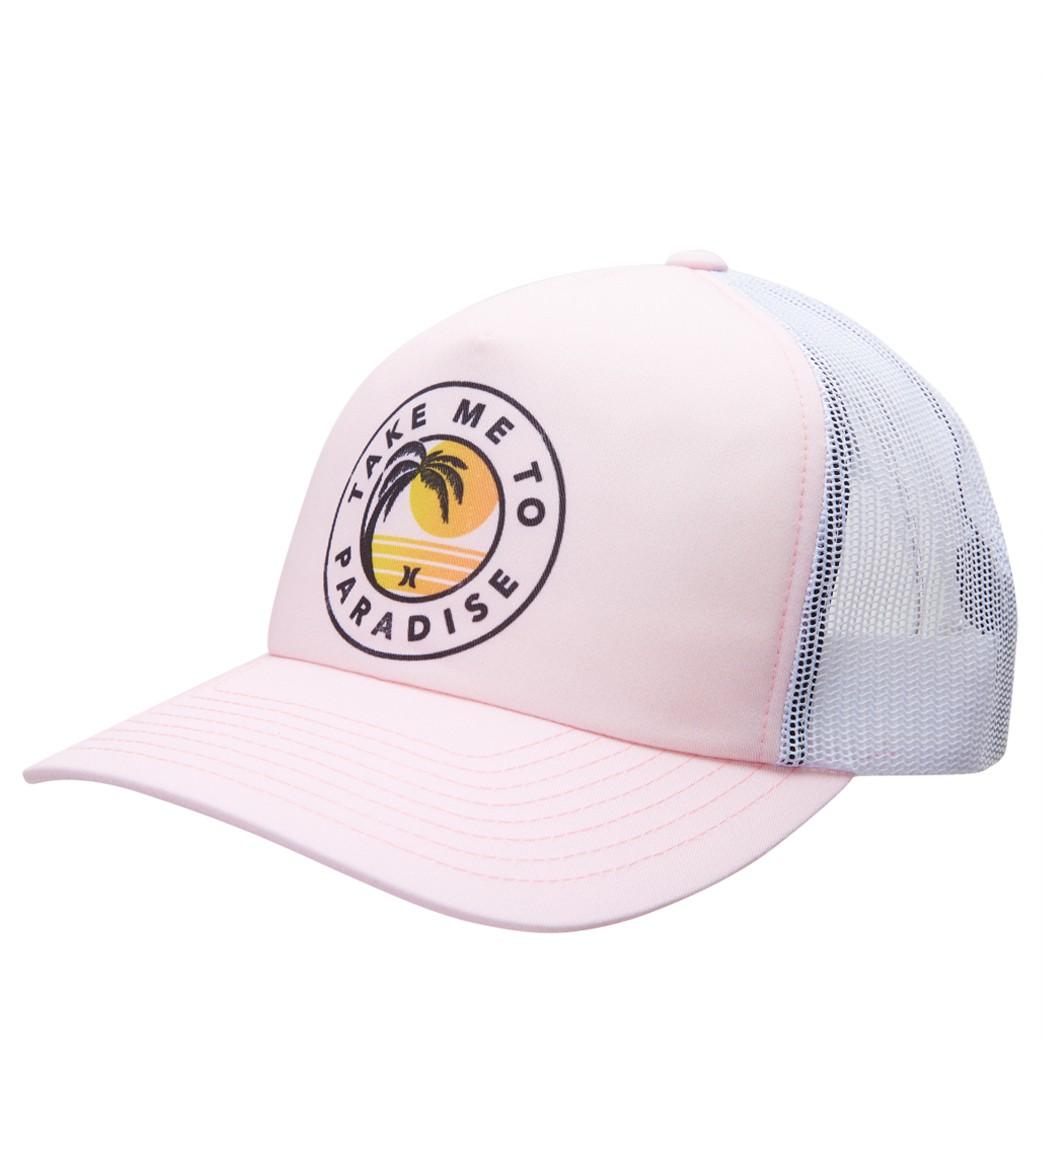 70324aa7e Hurley Women's Take Me To Paradise Trucker Hat